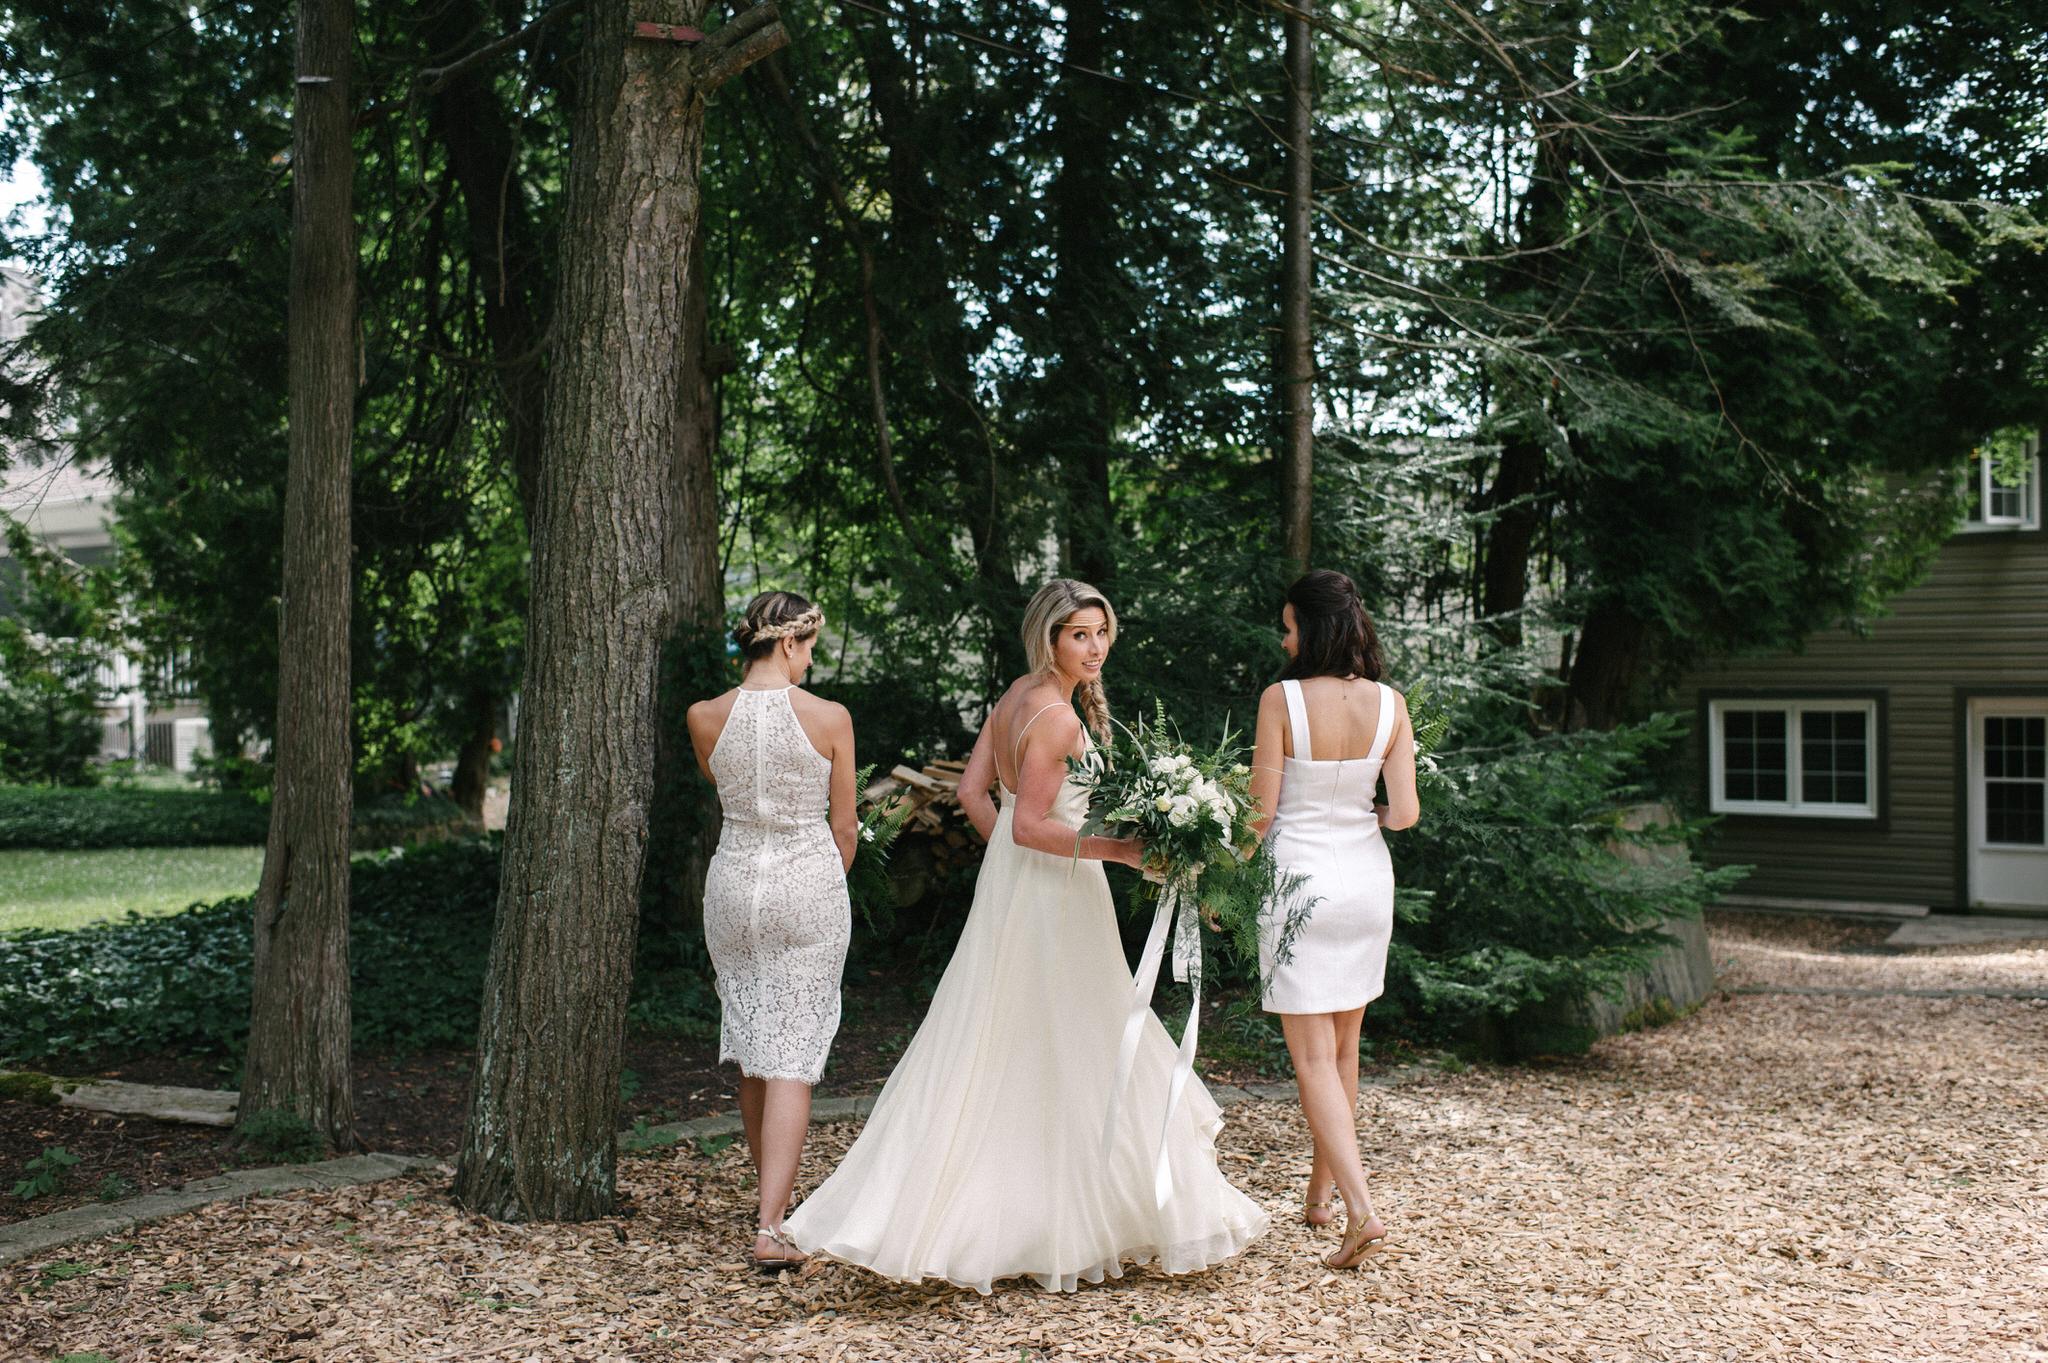 toronto wedding photography scarlet oneill051.JPG